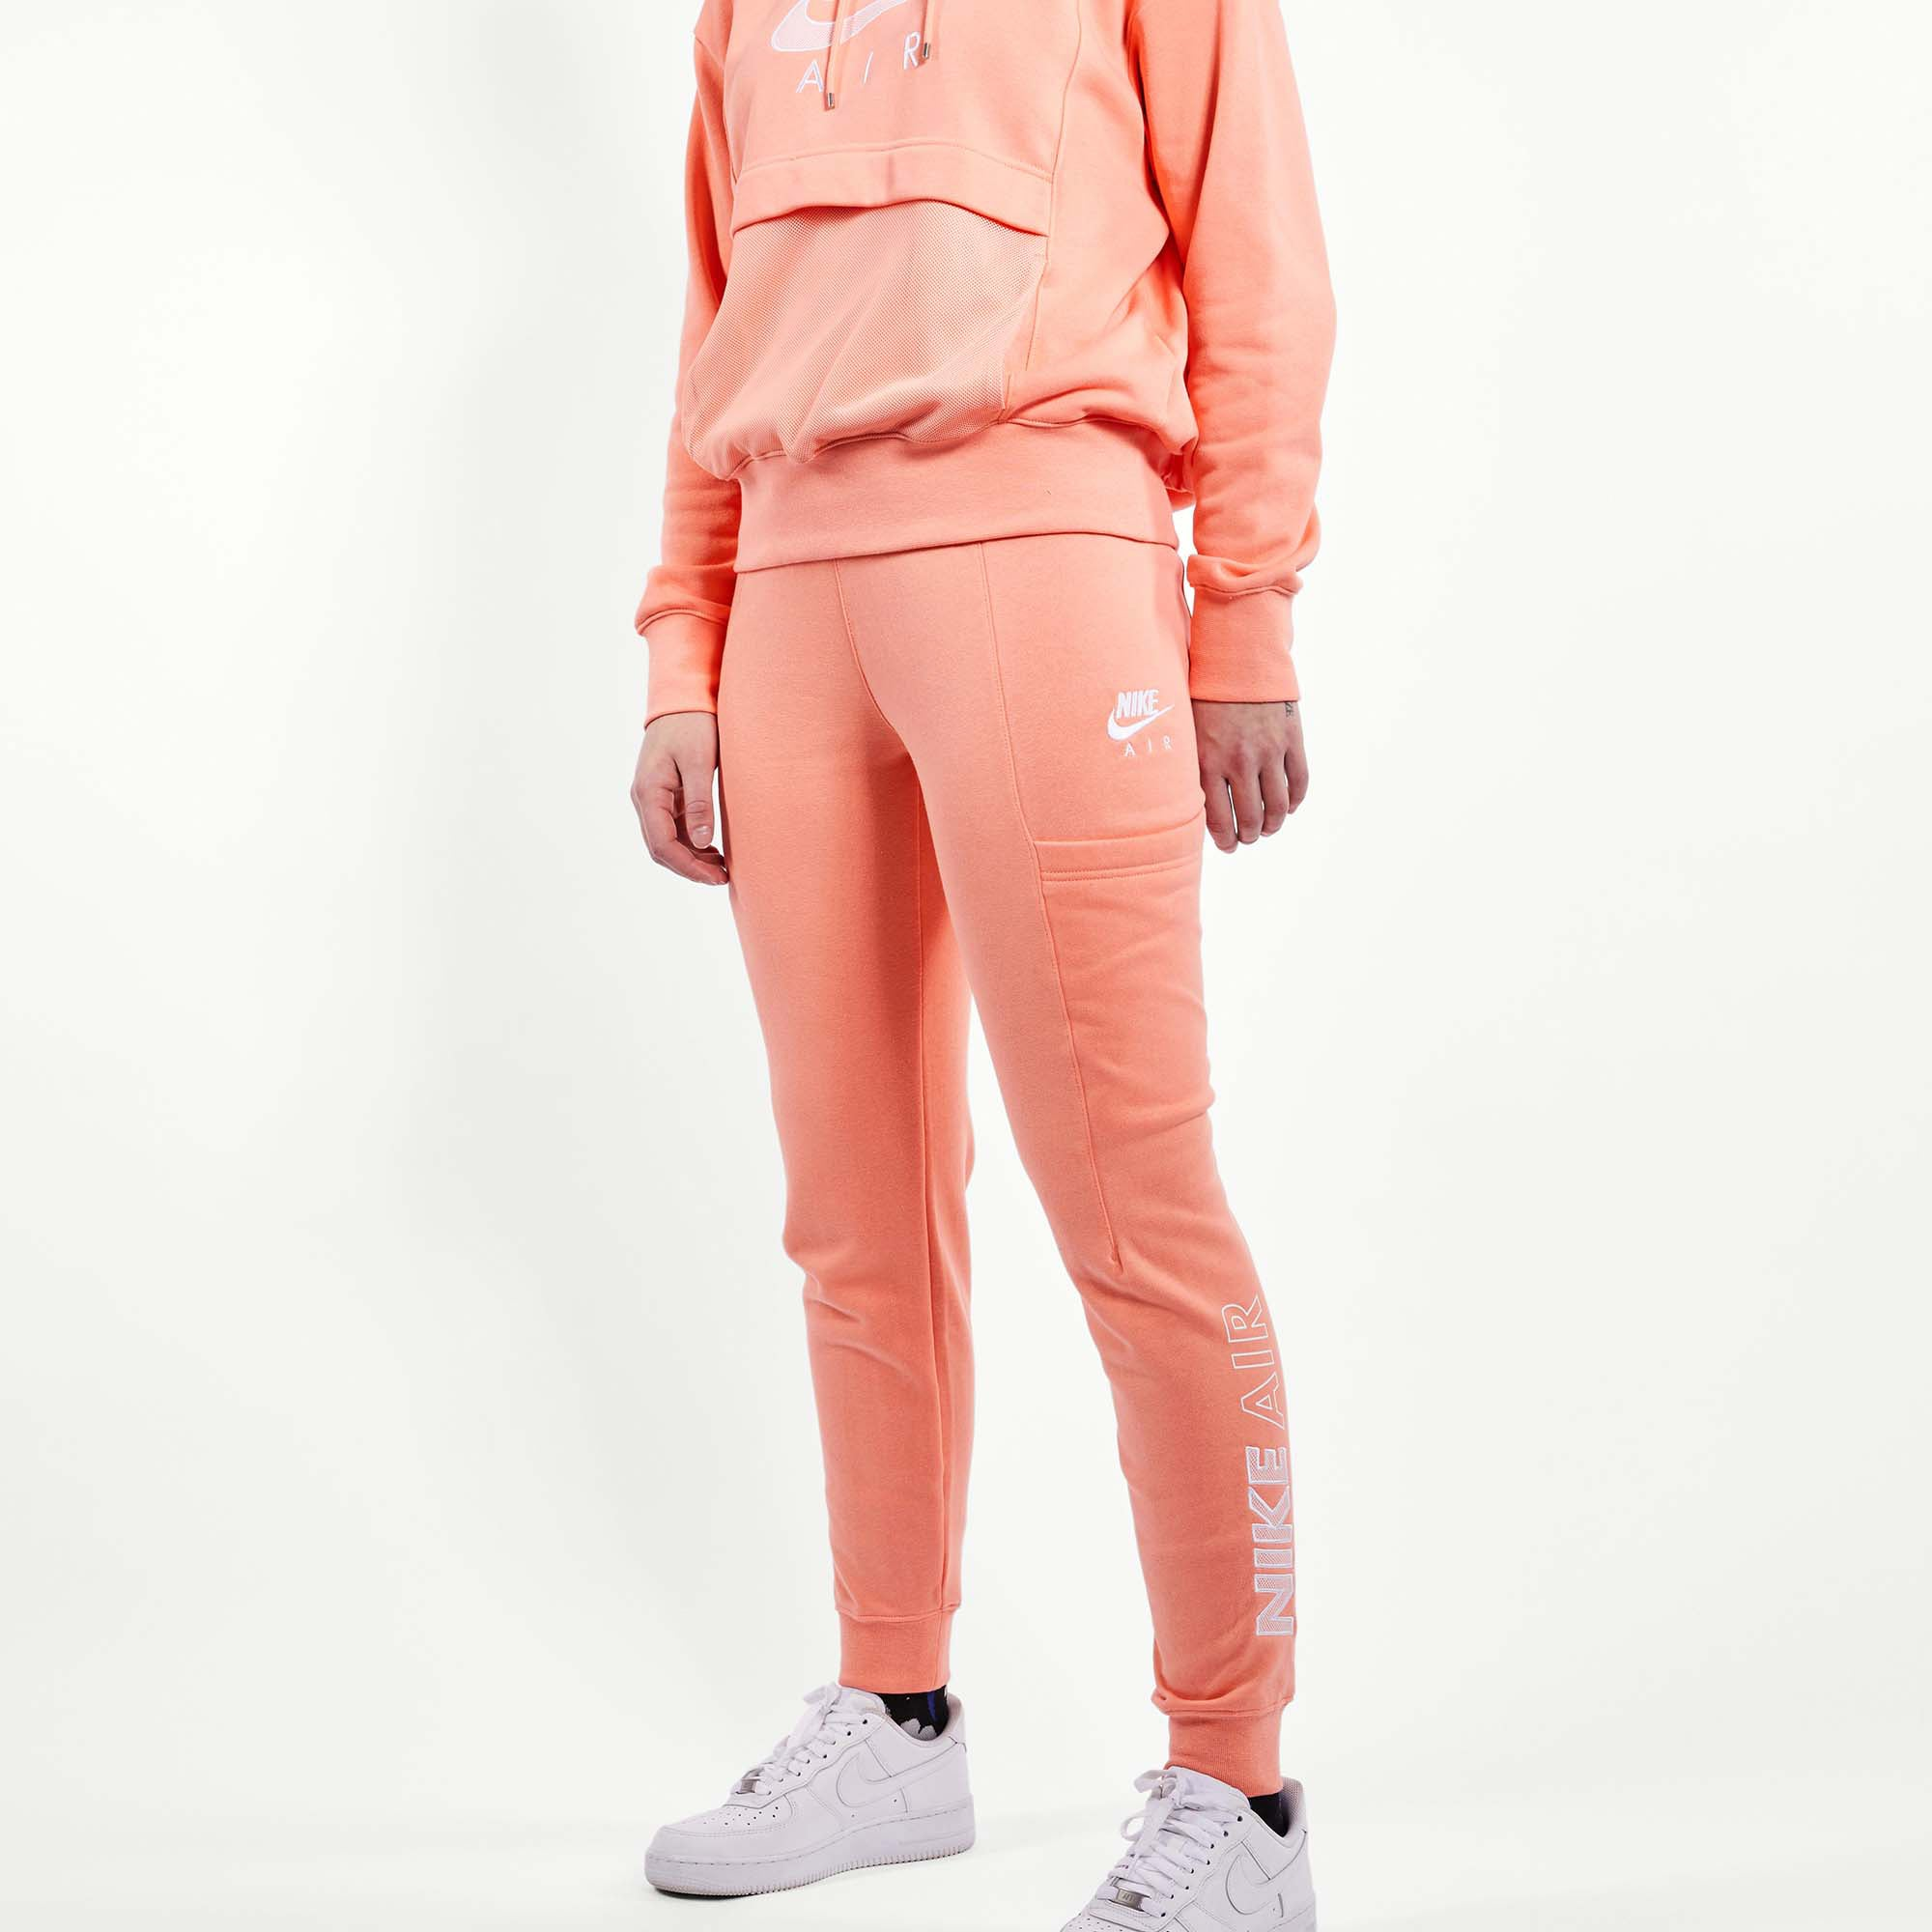 Nike Air Cuffed - Women Pants